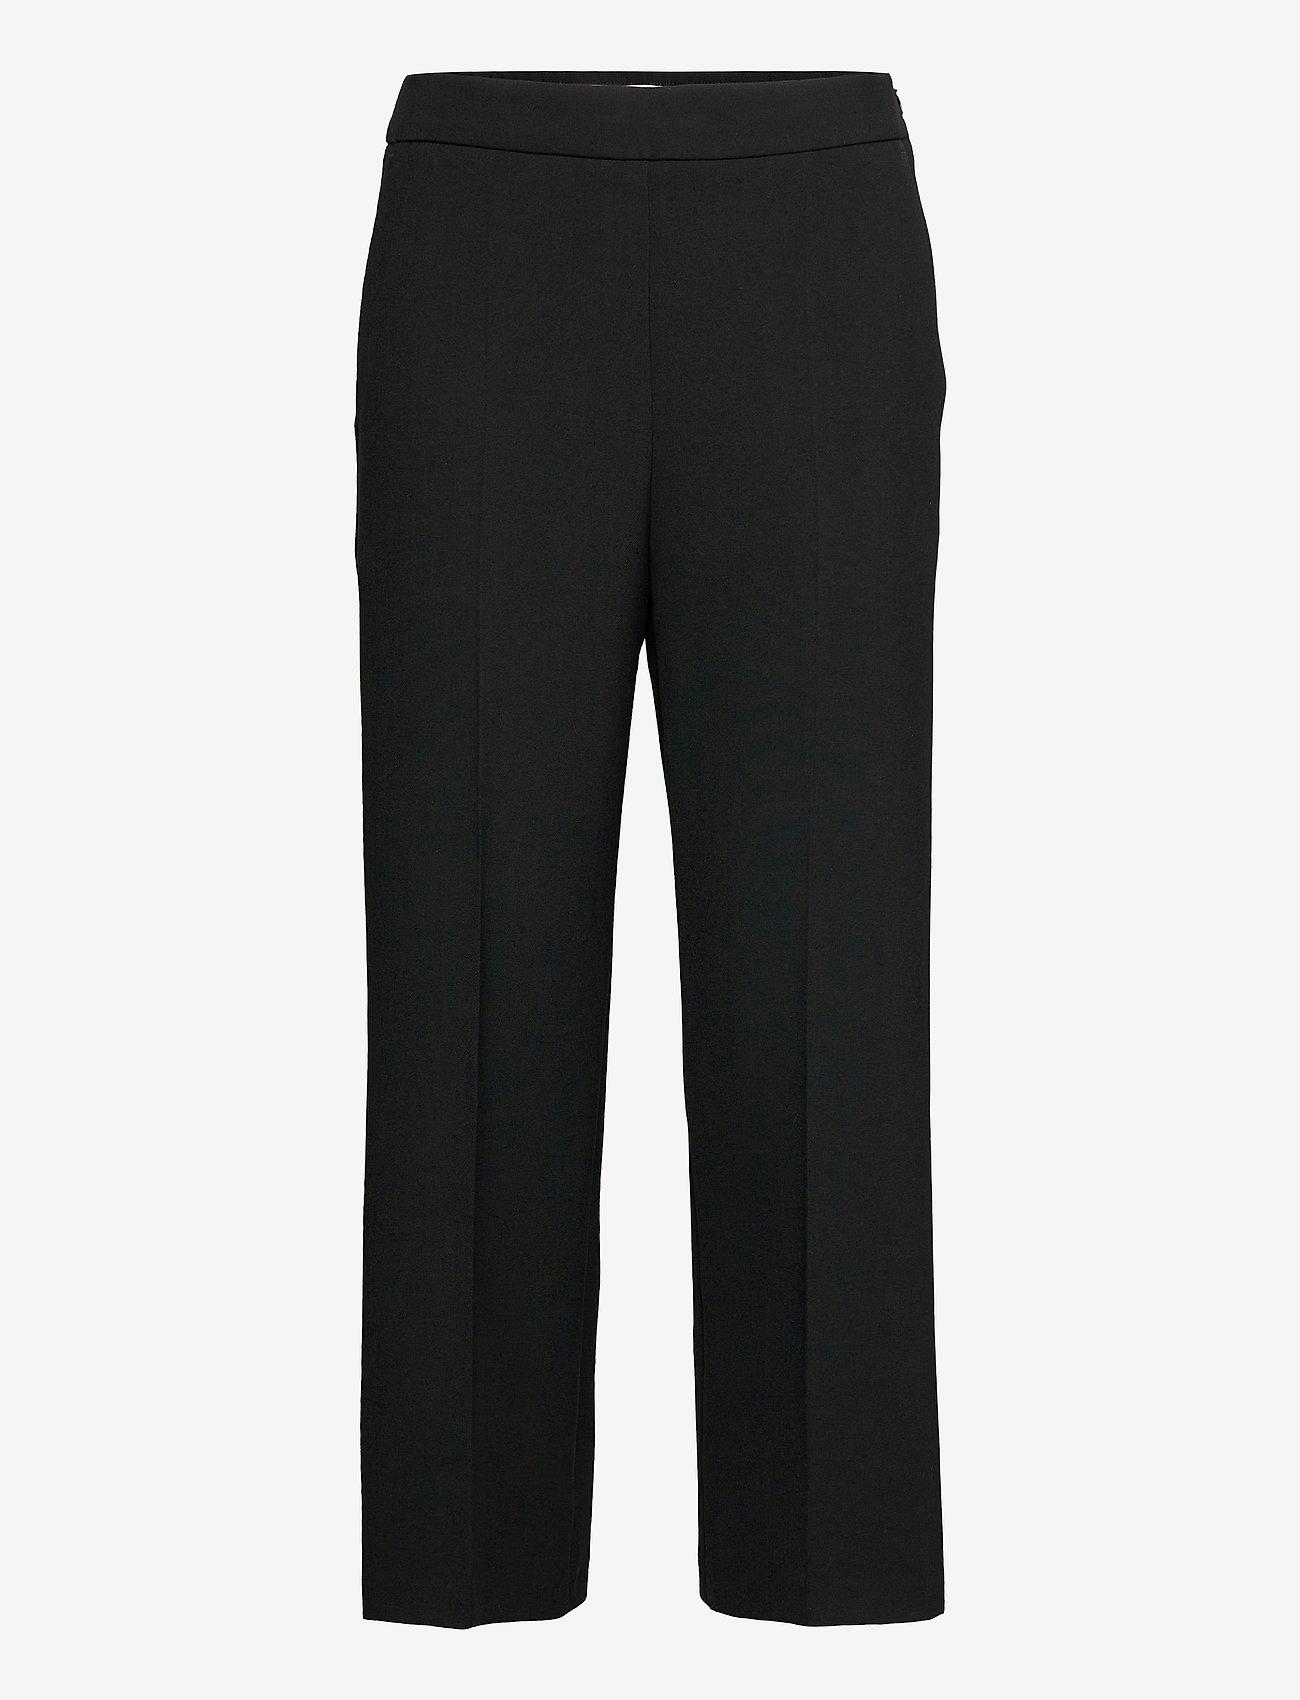 Marimekko - HAKKU SOLID TROUSERS - bukser med lige ben - black - 0